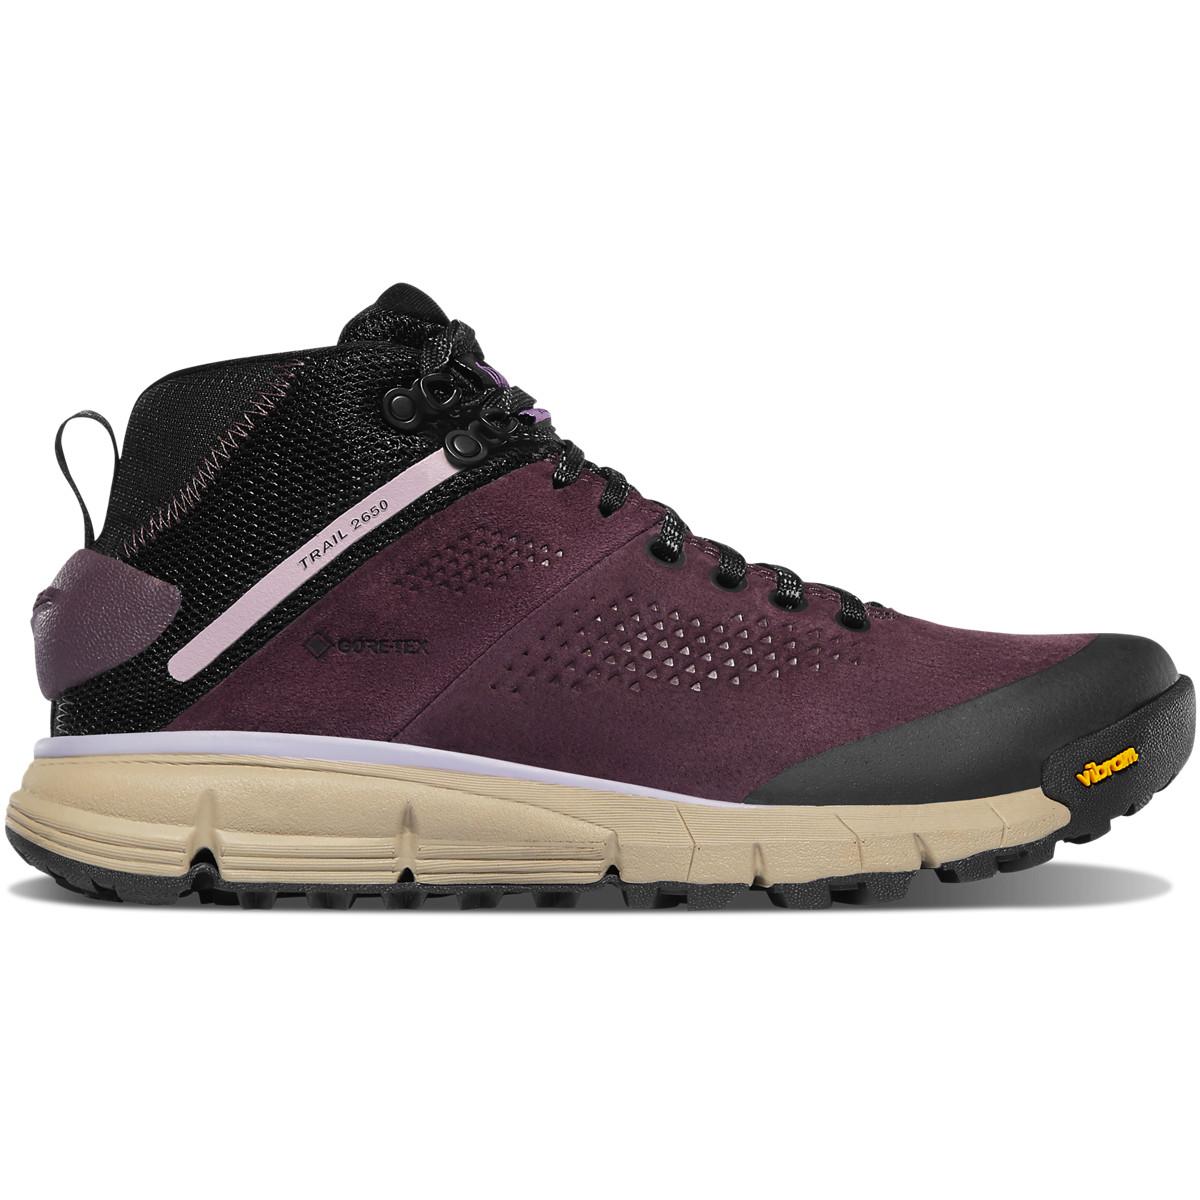 Women's Trail 2650 Mid 4